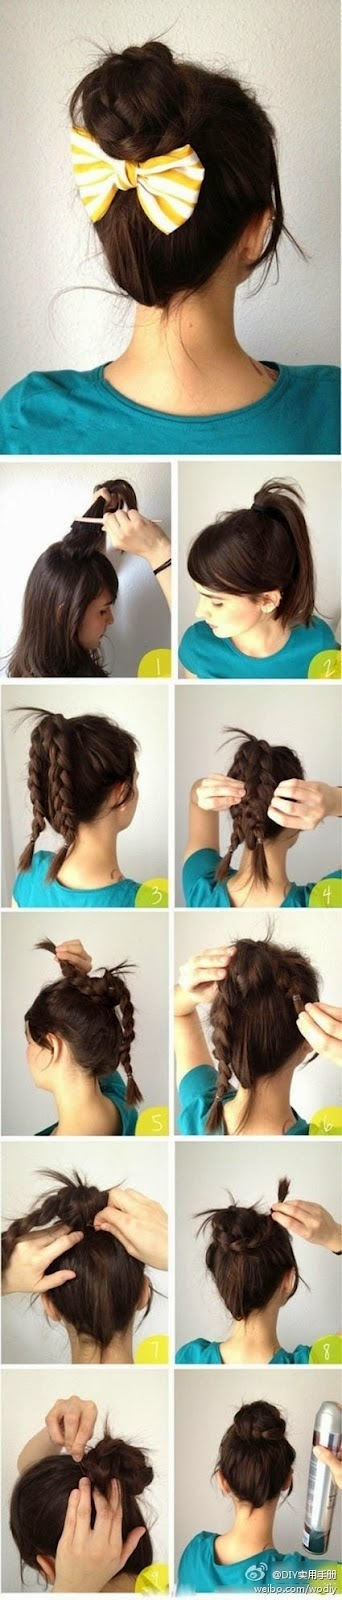 Cara Menata Rambut Panjang Yang Mudah Ala Braided Bun